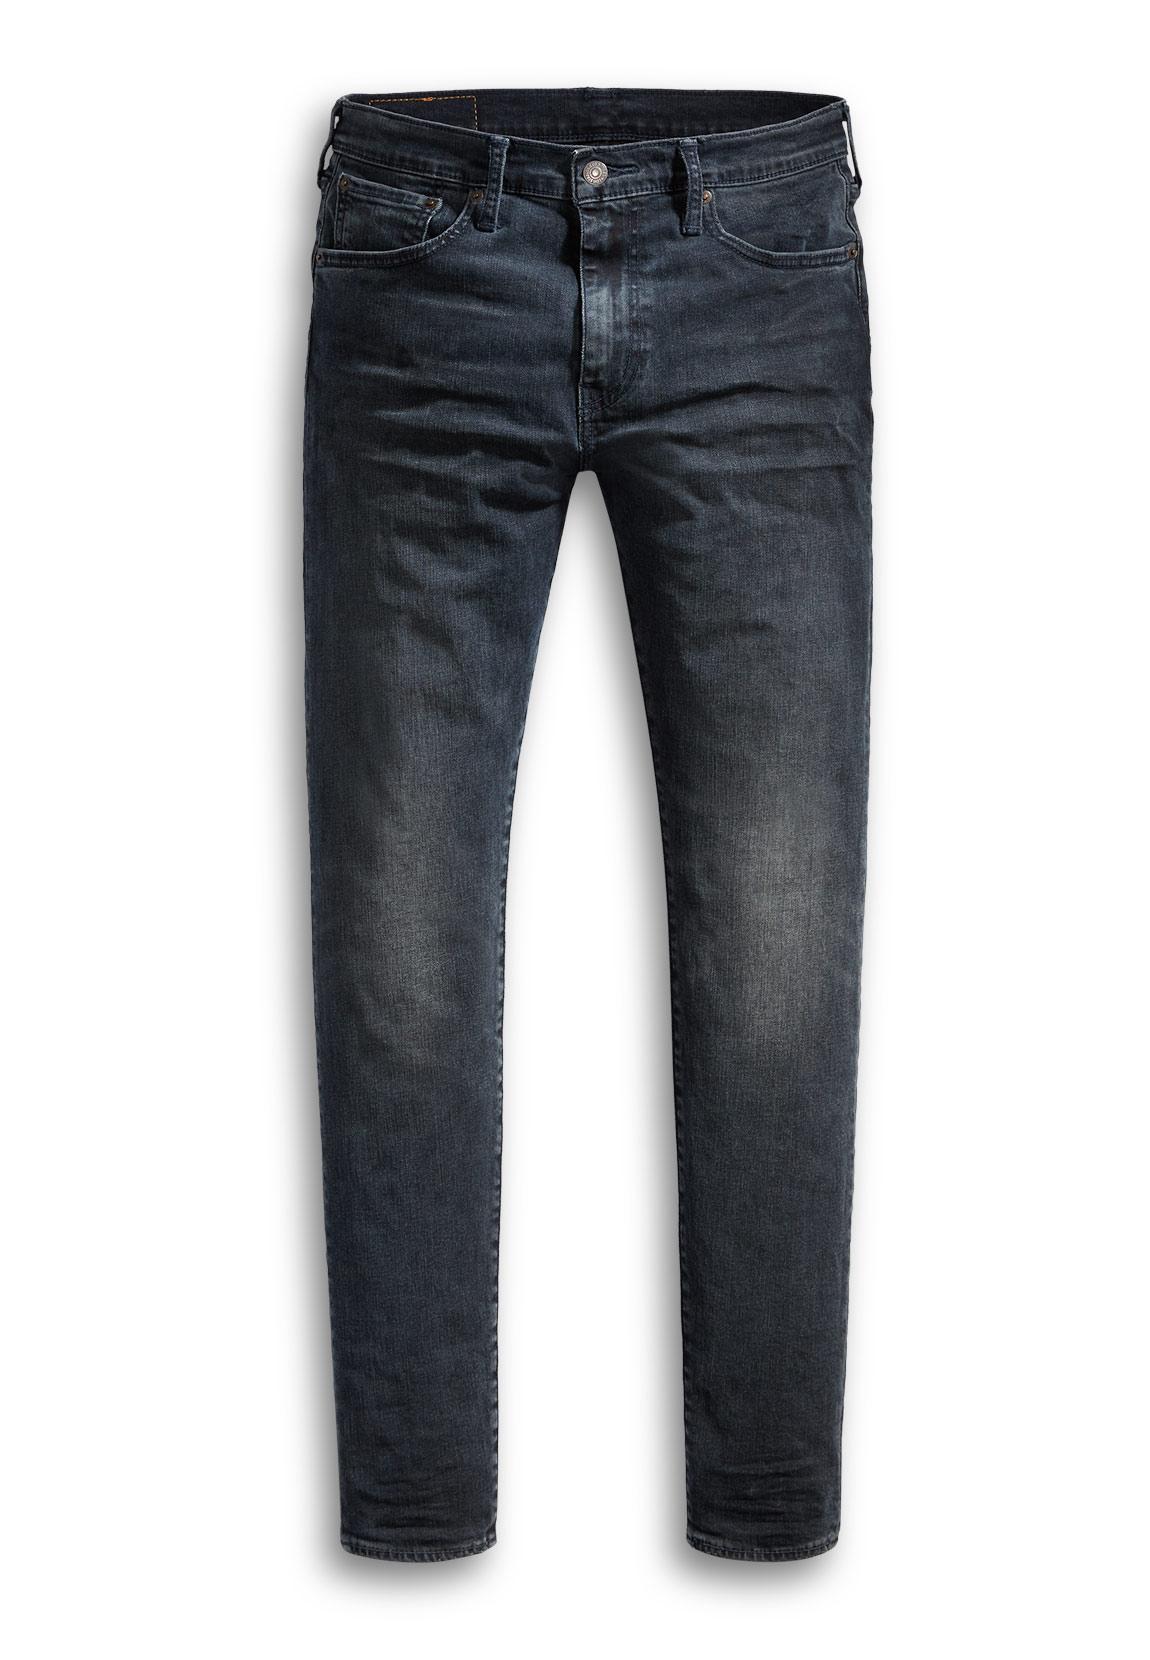 levis herren jeans 512 slim taper fit 28833 0062 steinway herren jeans chinos. Black Bedroom Furniture Sets. Home Design Ideas